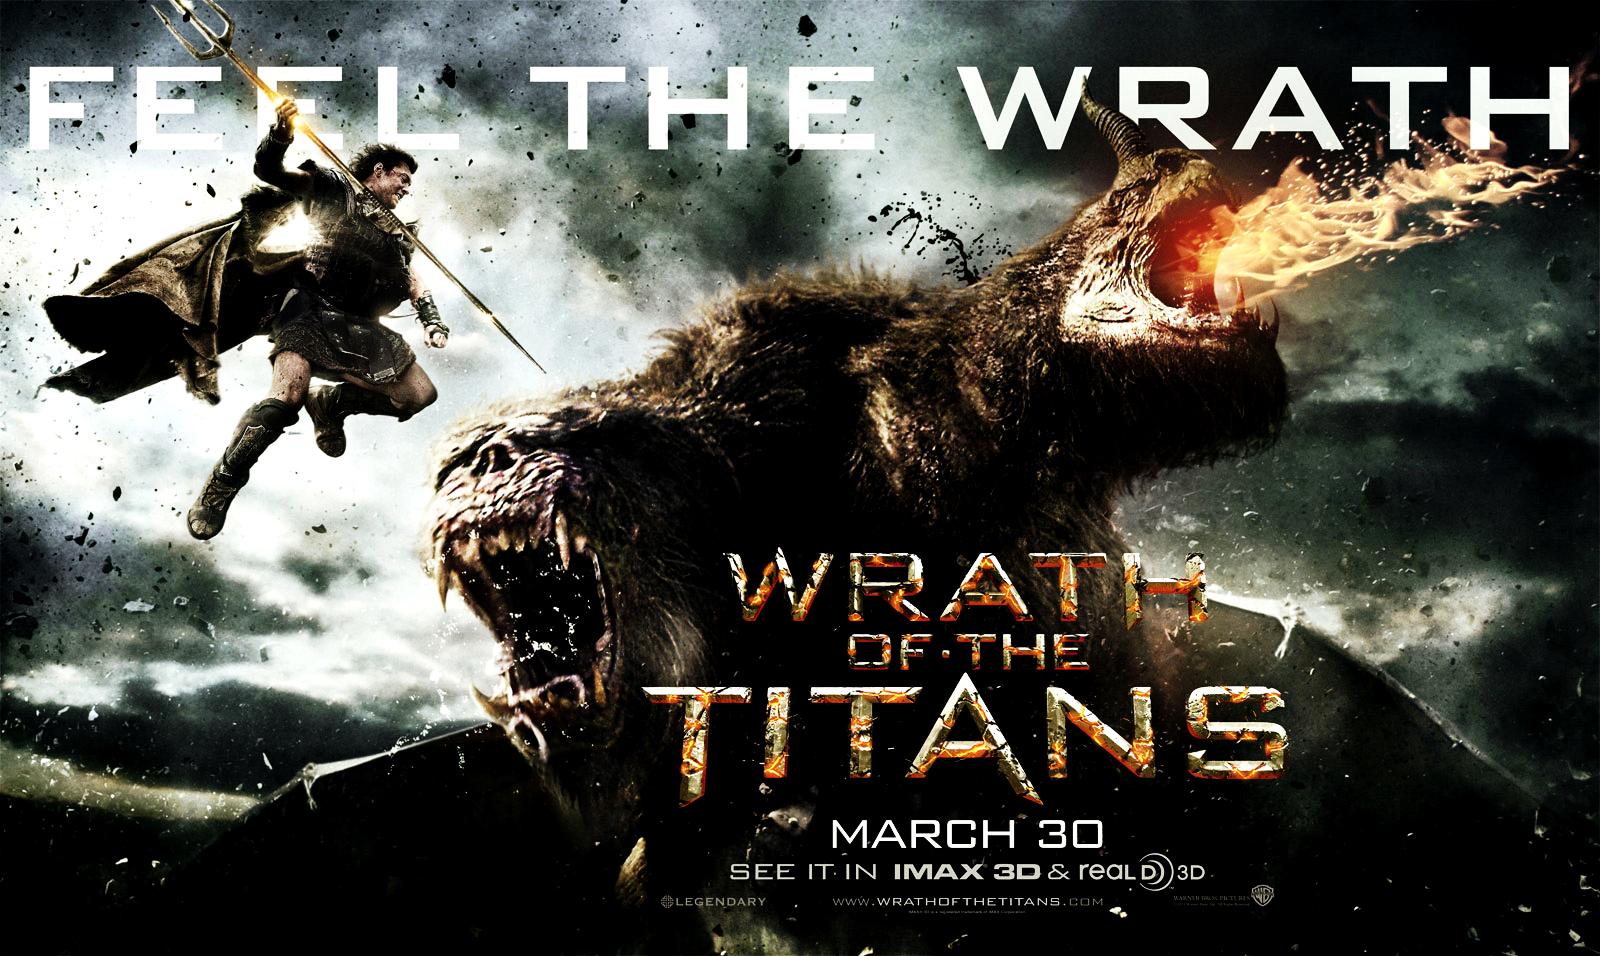 http://3.bp.blogspot.com/--7LScpMHiHI/T0PZz-6-MGI/AAAAAAAAAr8/36IYaZ1QcI0/s1600/Wrath_of_The_Titans_Chimera_Feel_The_Wrath_HD_Wallpaper-Vvallpaper.Net.jpg